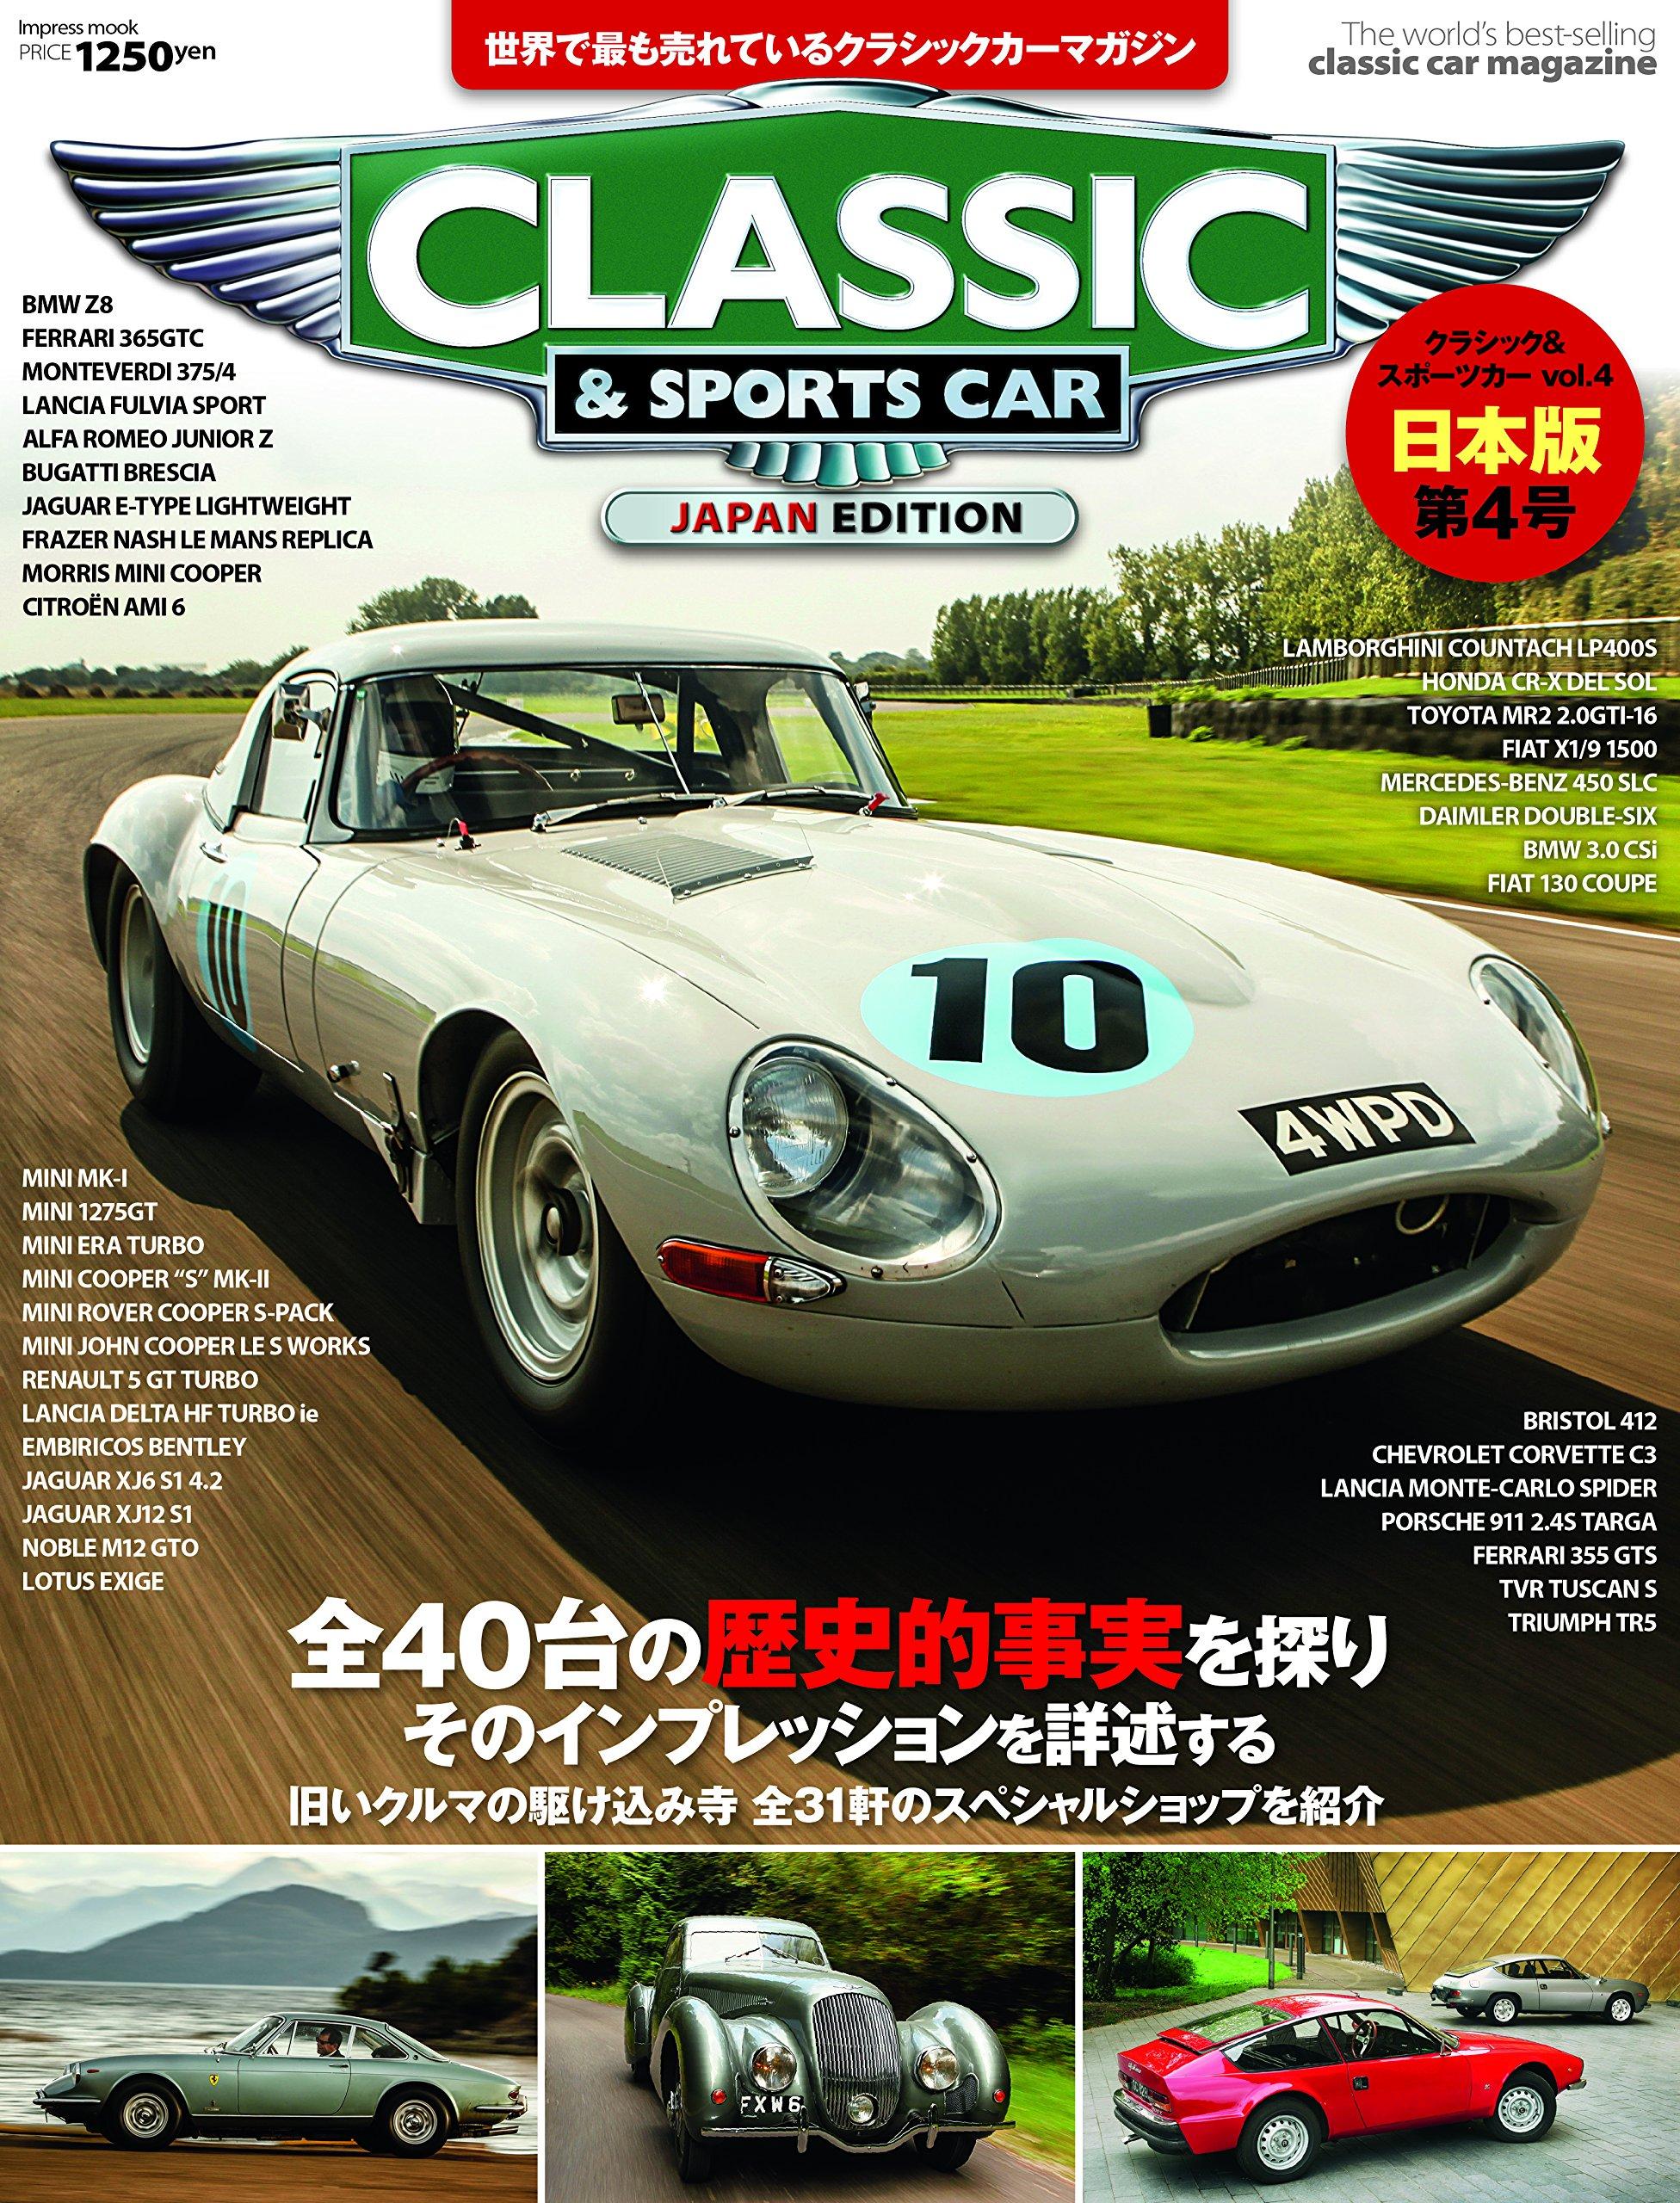 Classic & Sports Vol. 4 (inpuresumukku) (Japanese) Mook